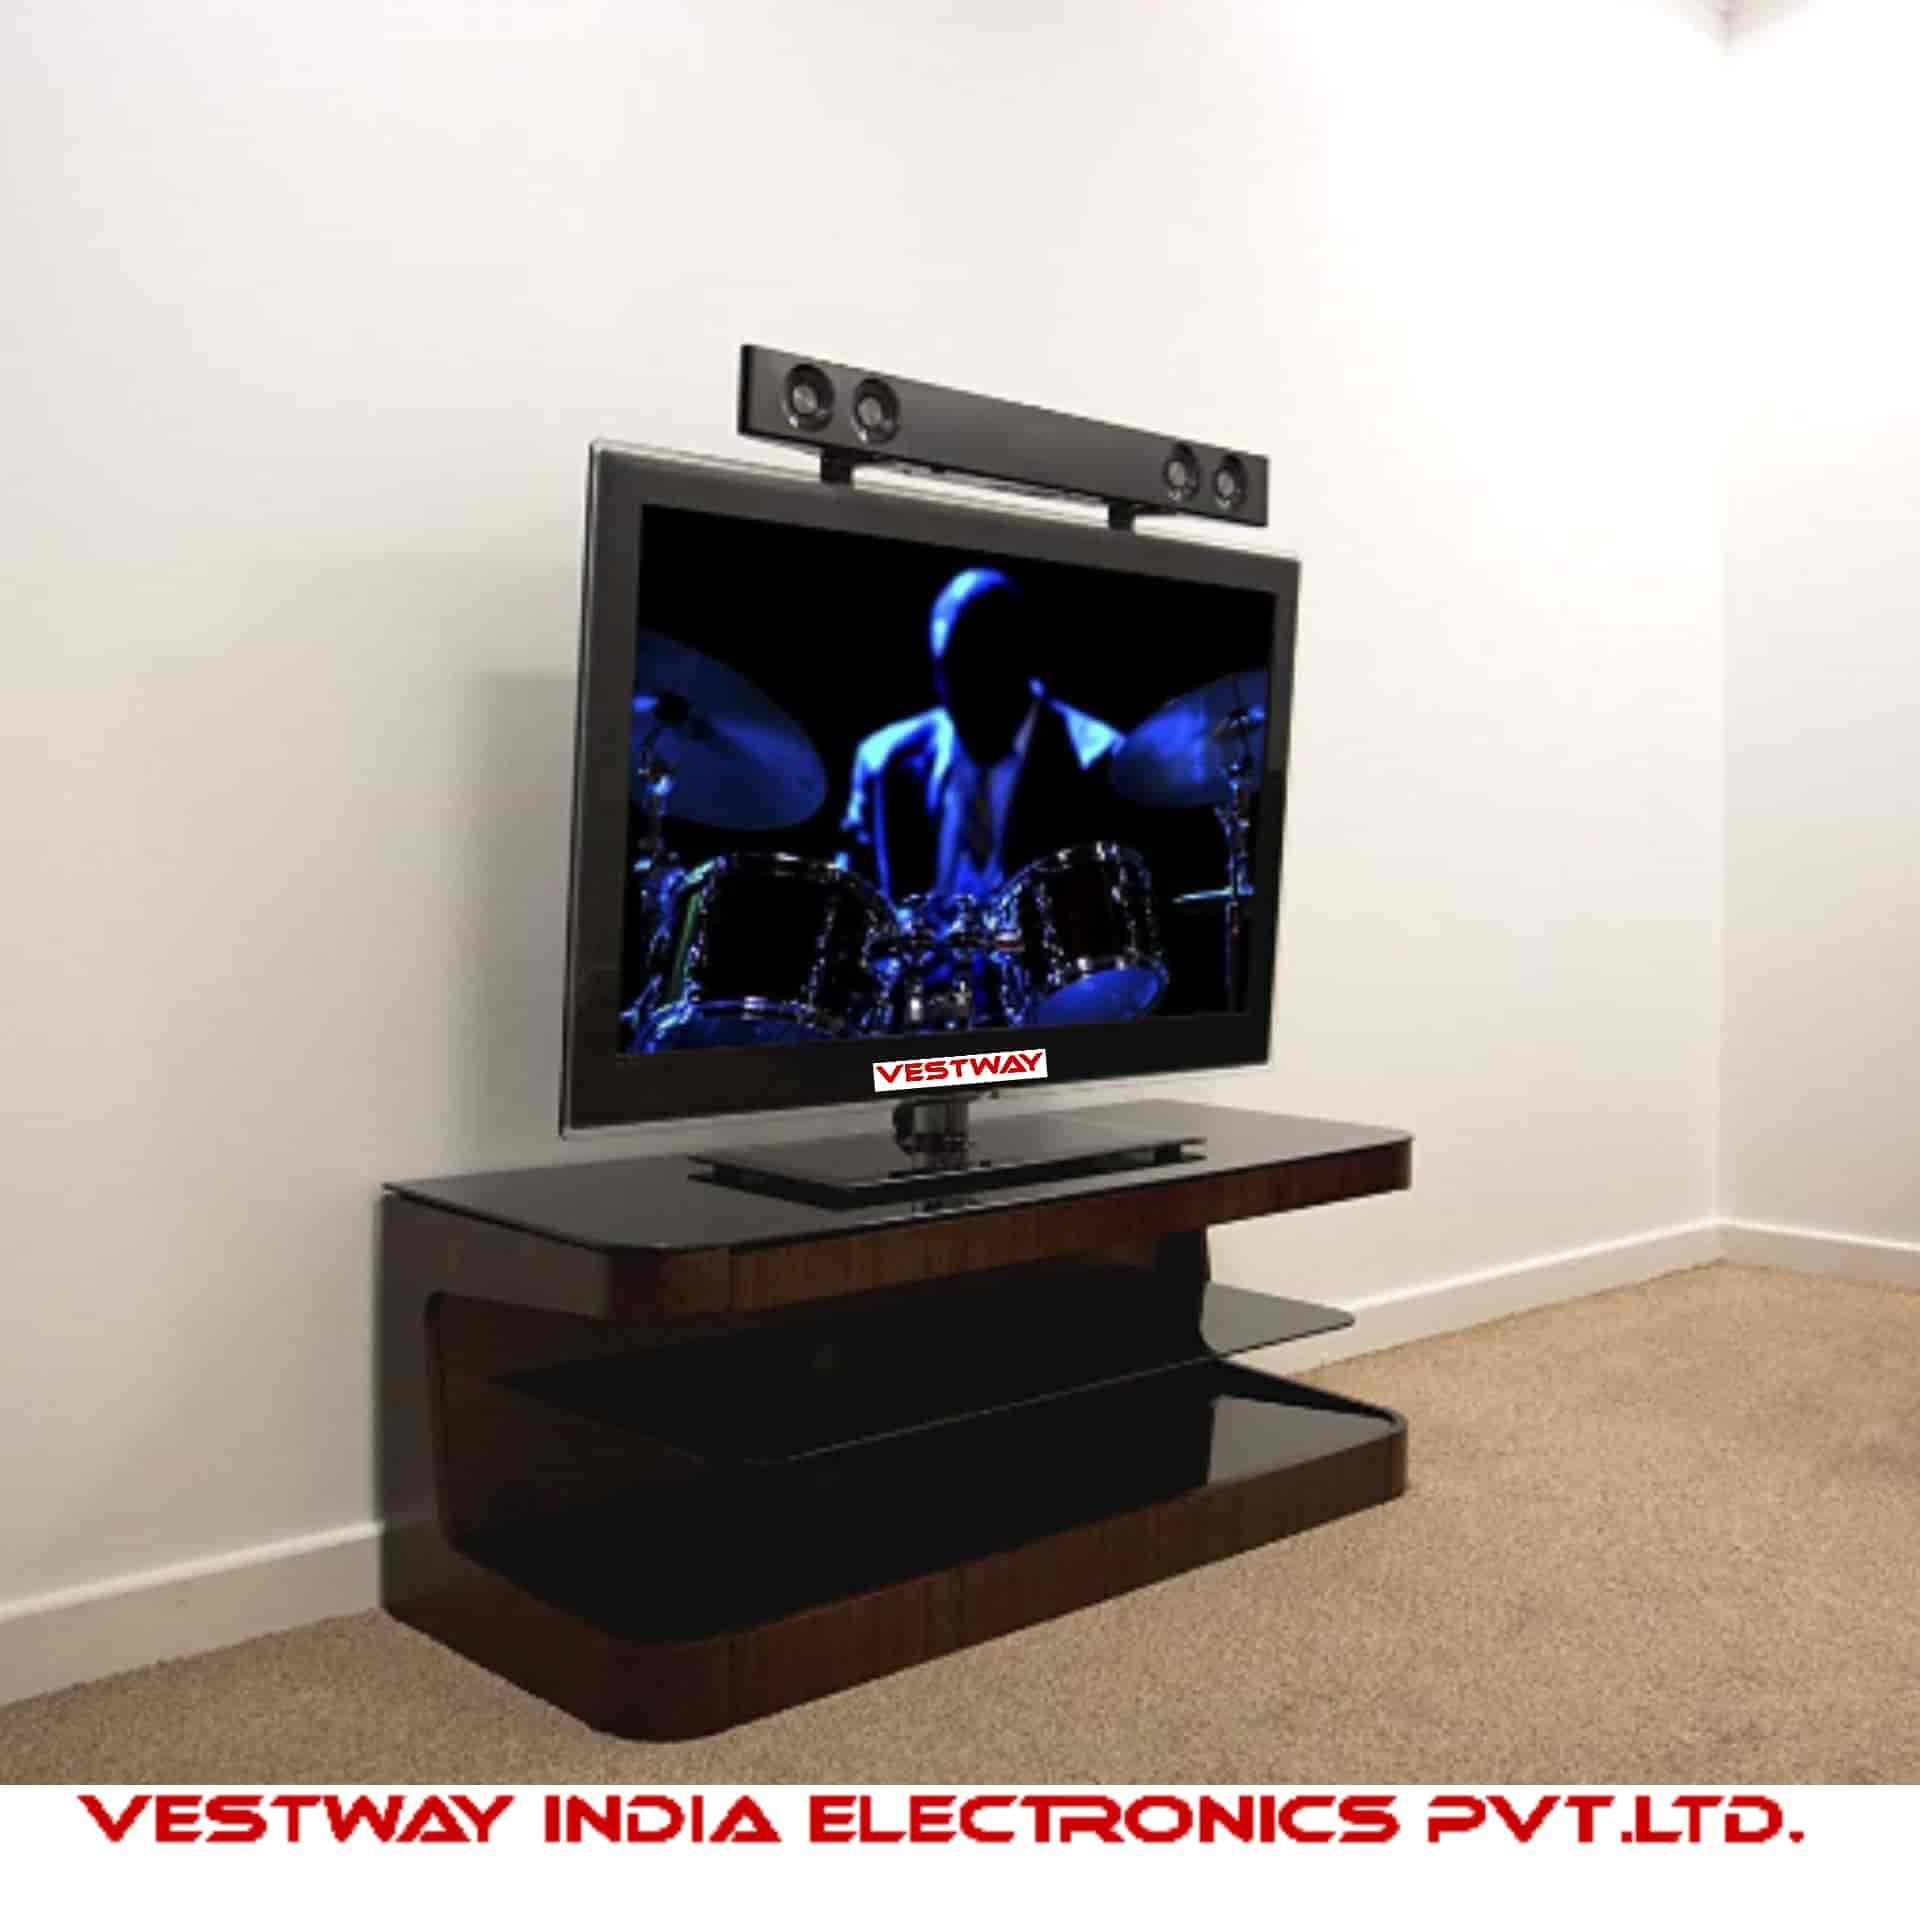 Vestway INDIA Electronics Pvt Ltd, Sector 63 - LED TV